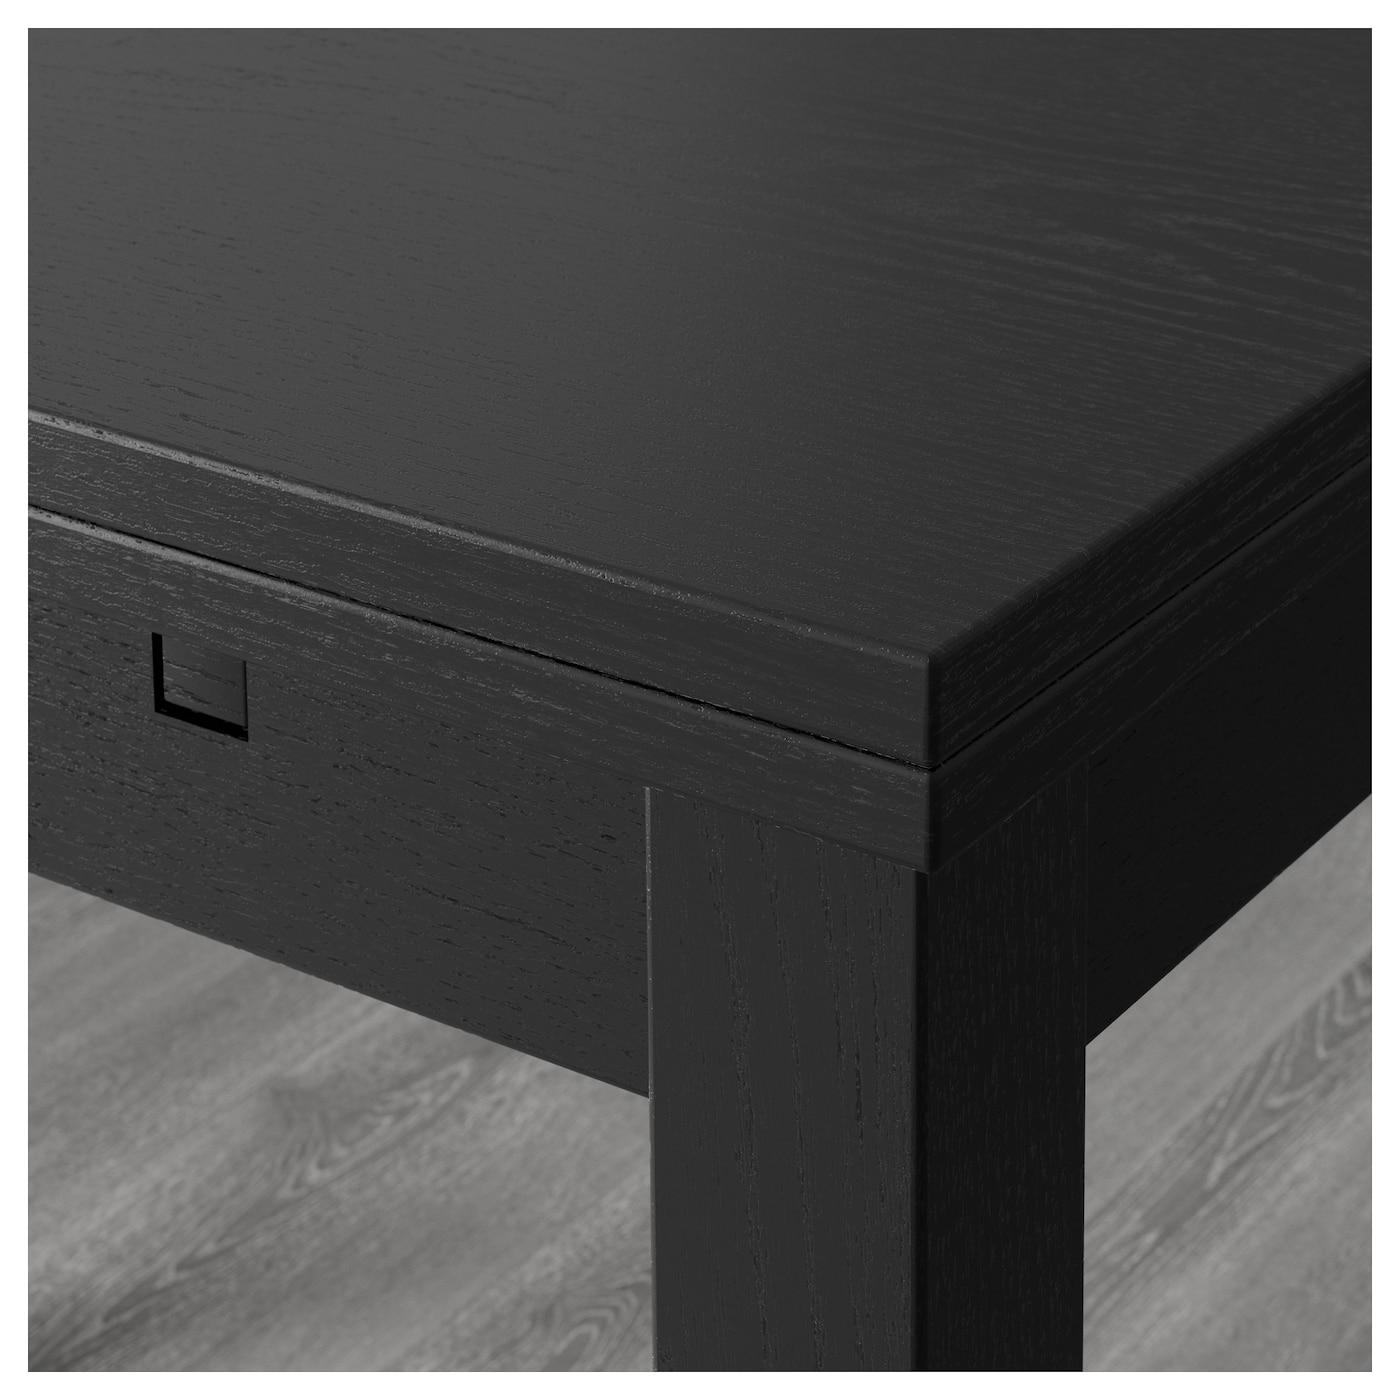 BJURSTA Extendable Table Brown Black 140 180 220x84 Cm